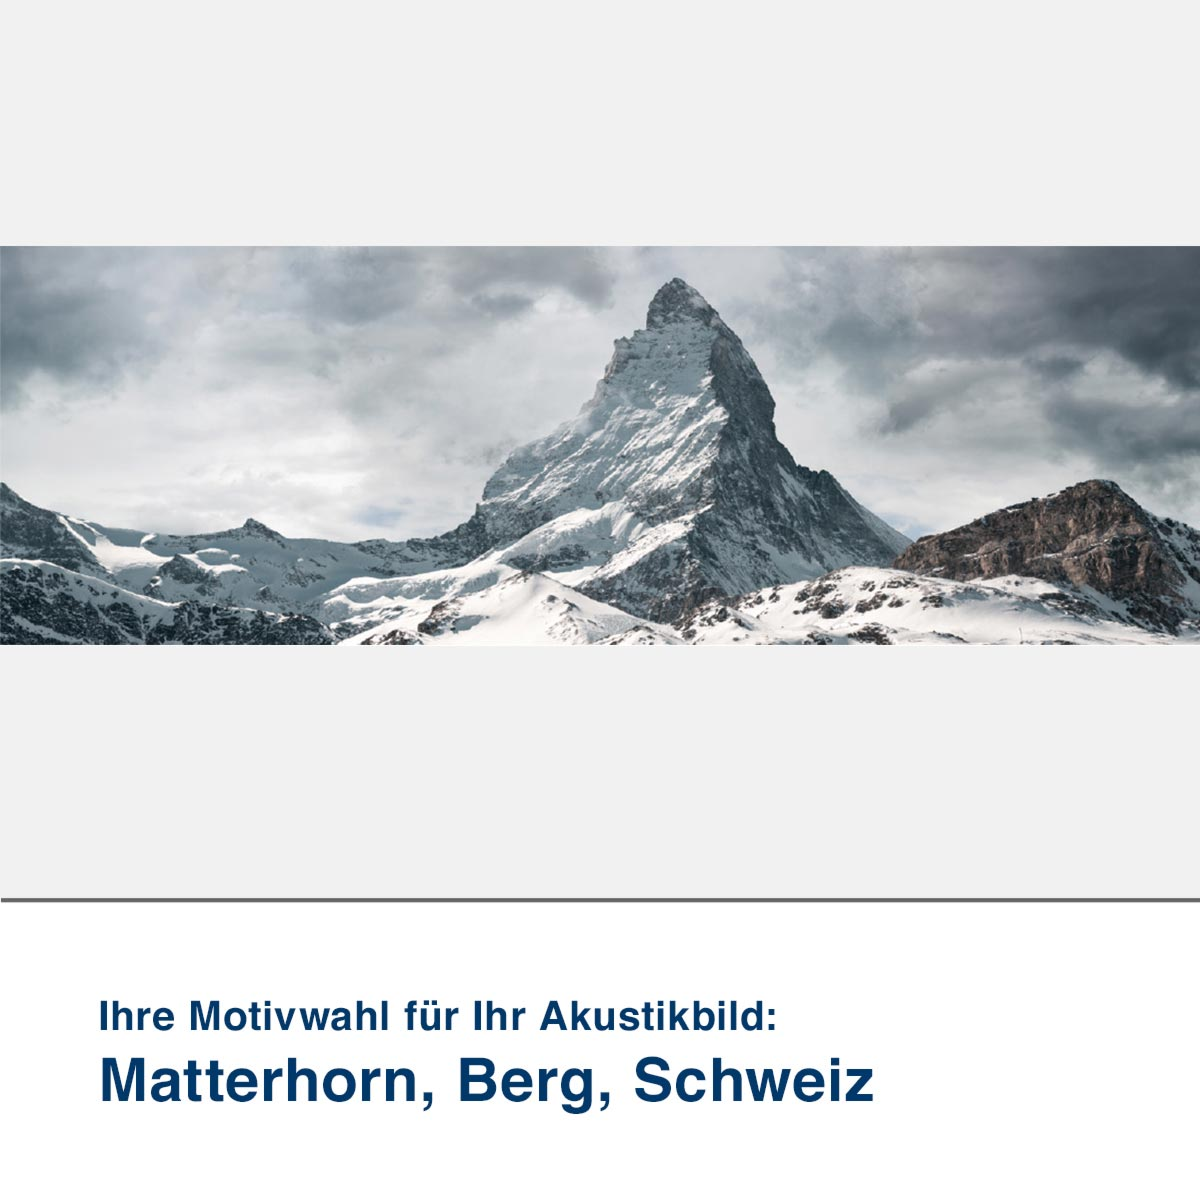 Akustikbild Motiv Matterhorn, Berg, Schweiz